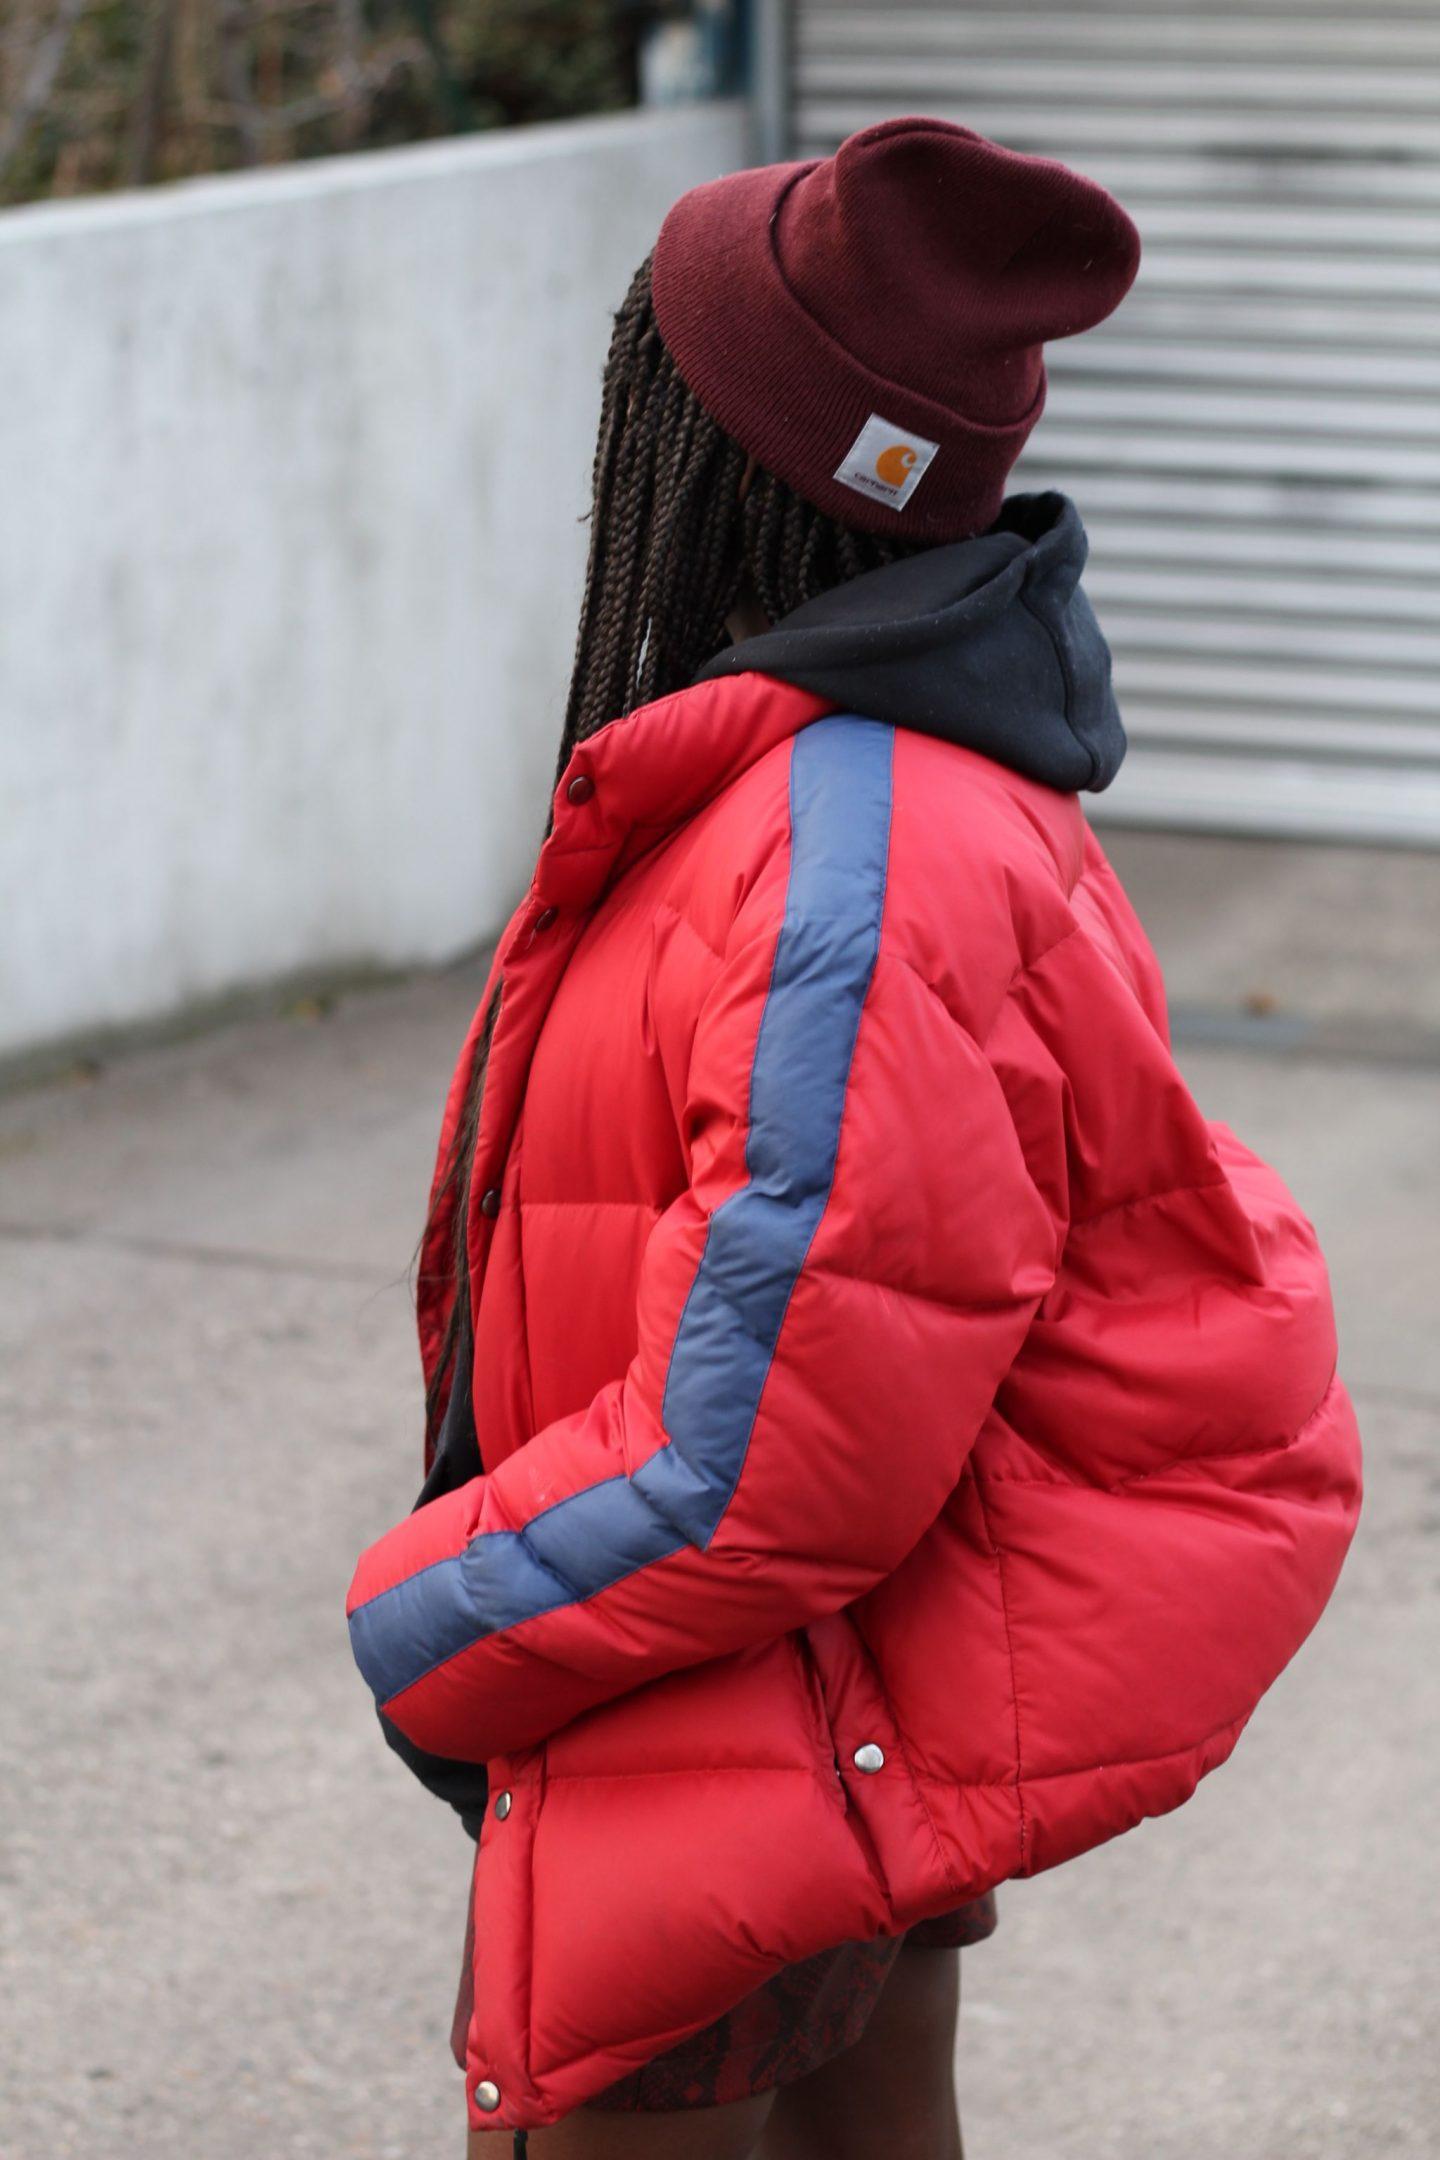 streetwear_chic_carhartt_mütze_lois_opoku_fashion_blog_style_berlin_lisforlois_2